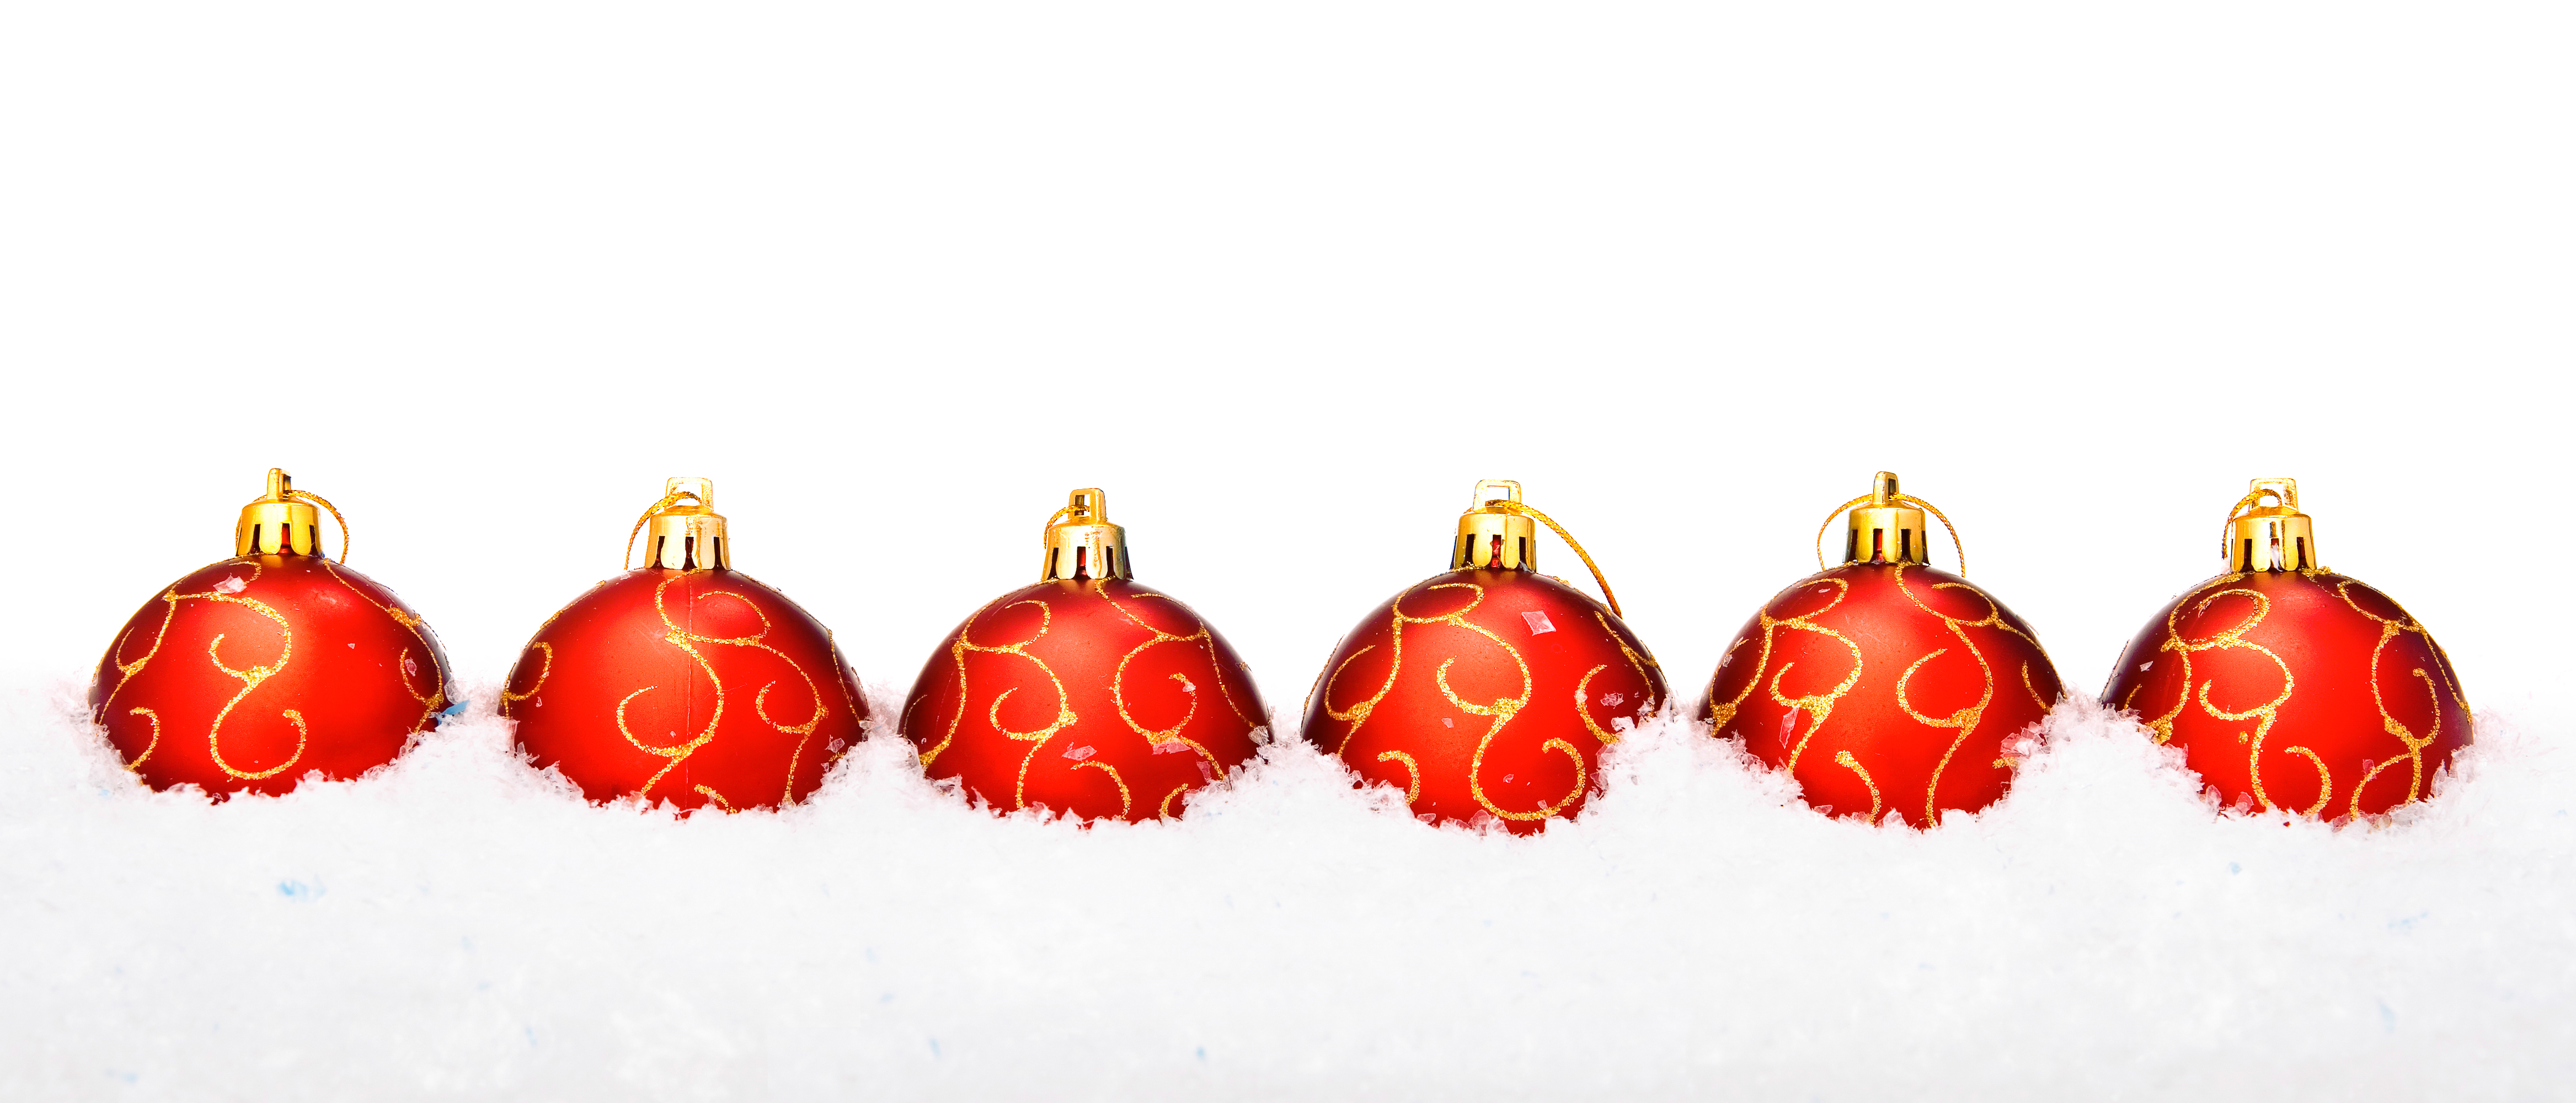 christmas balls, Year, Decorative, Xmas, White, HQ Photo